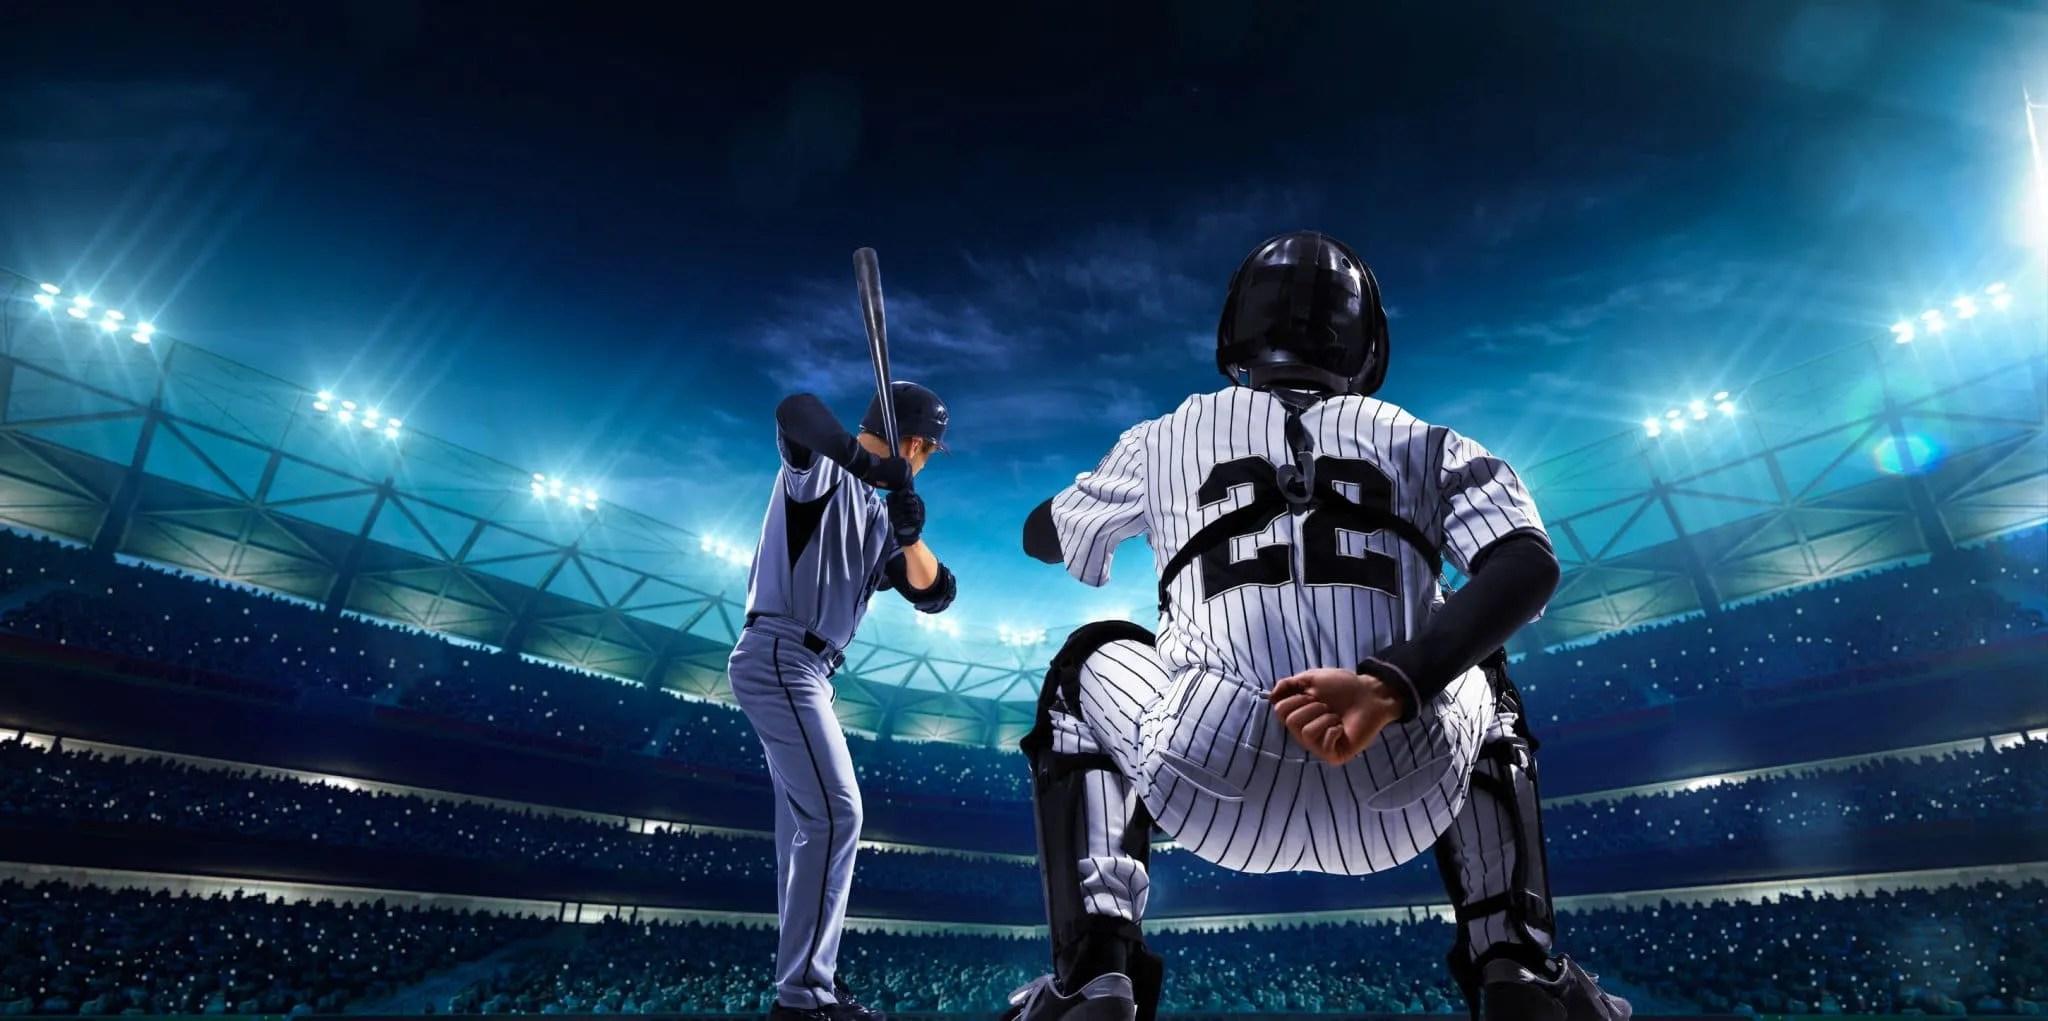 baseball batter aand catcher on 3-2